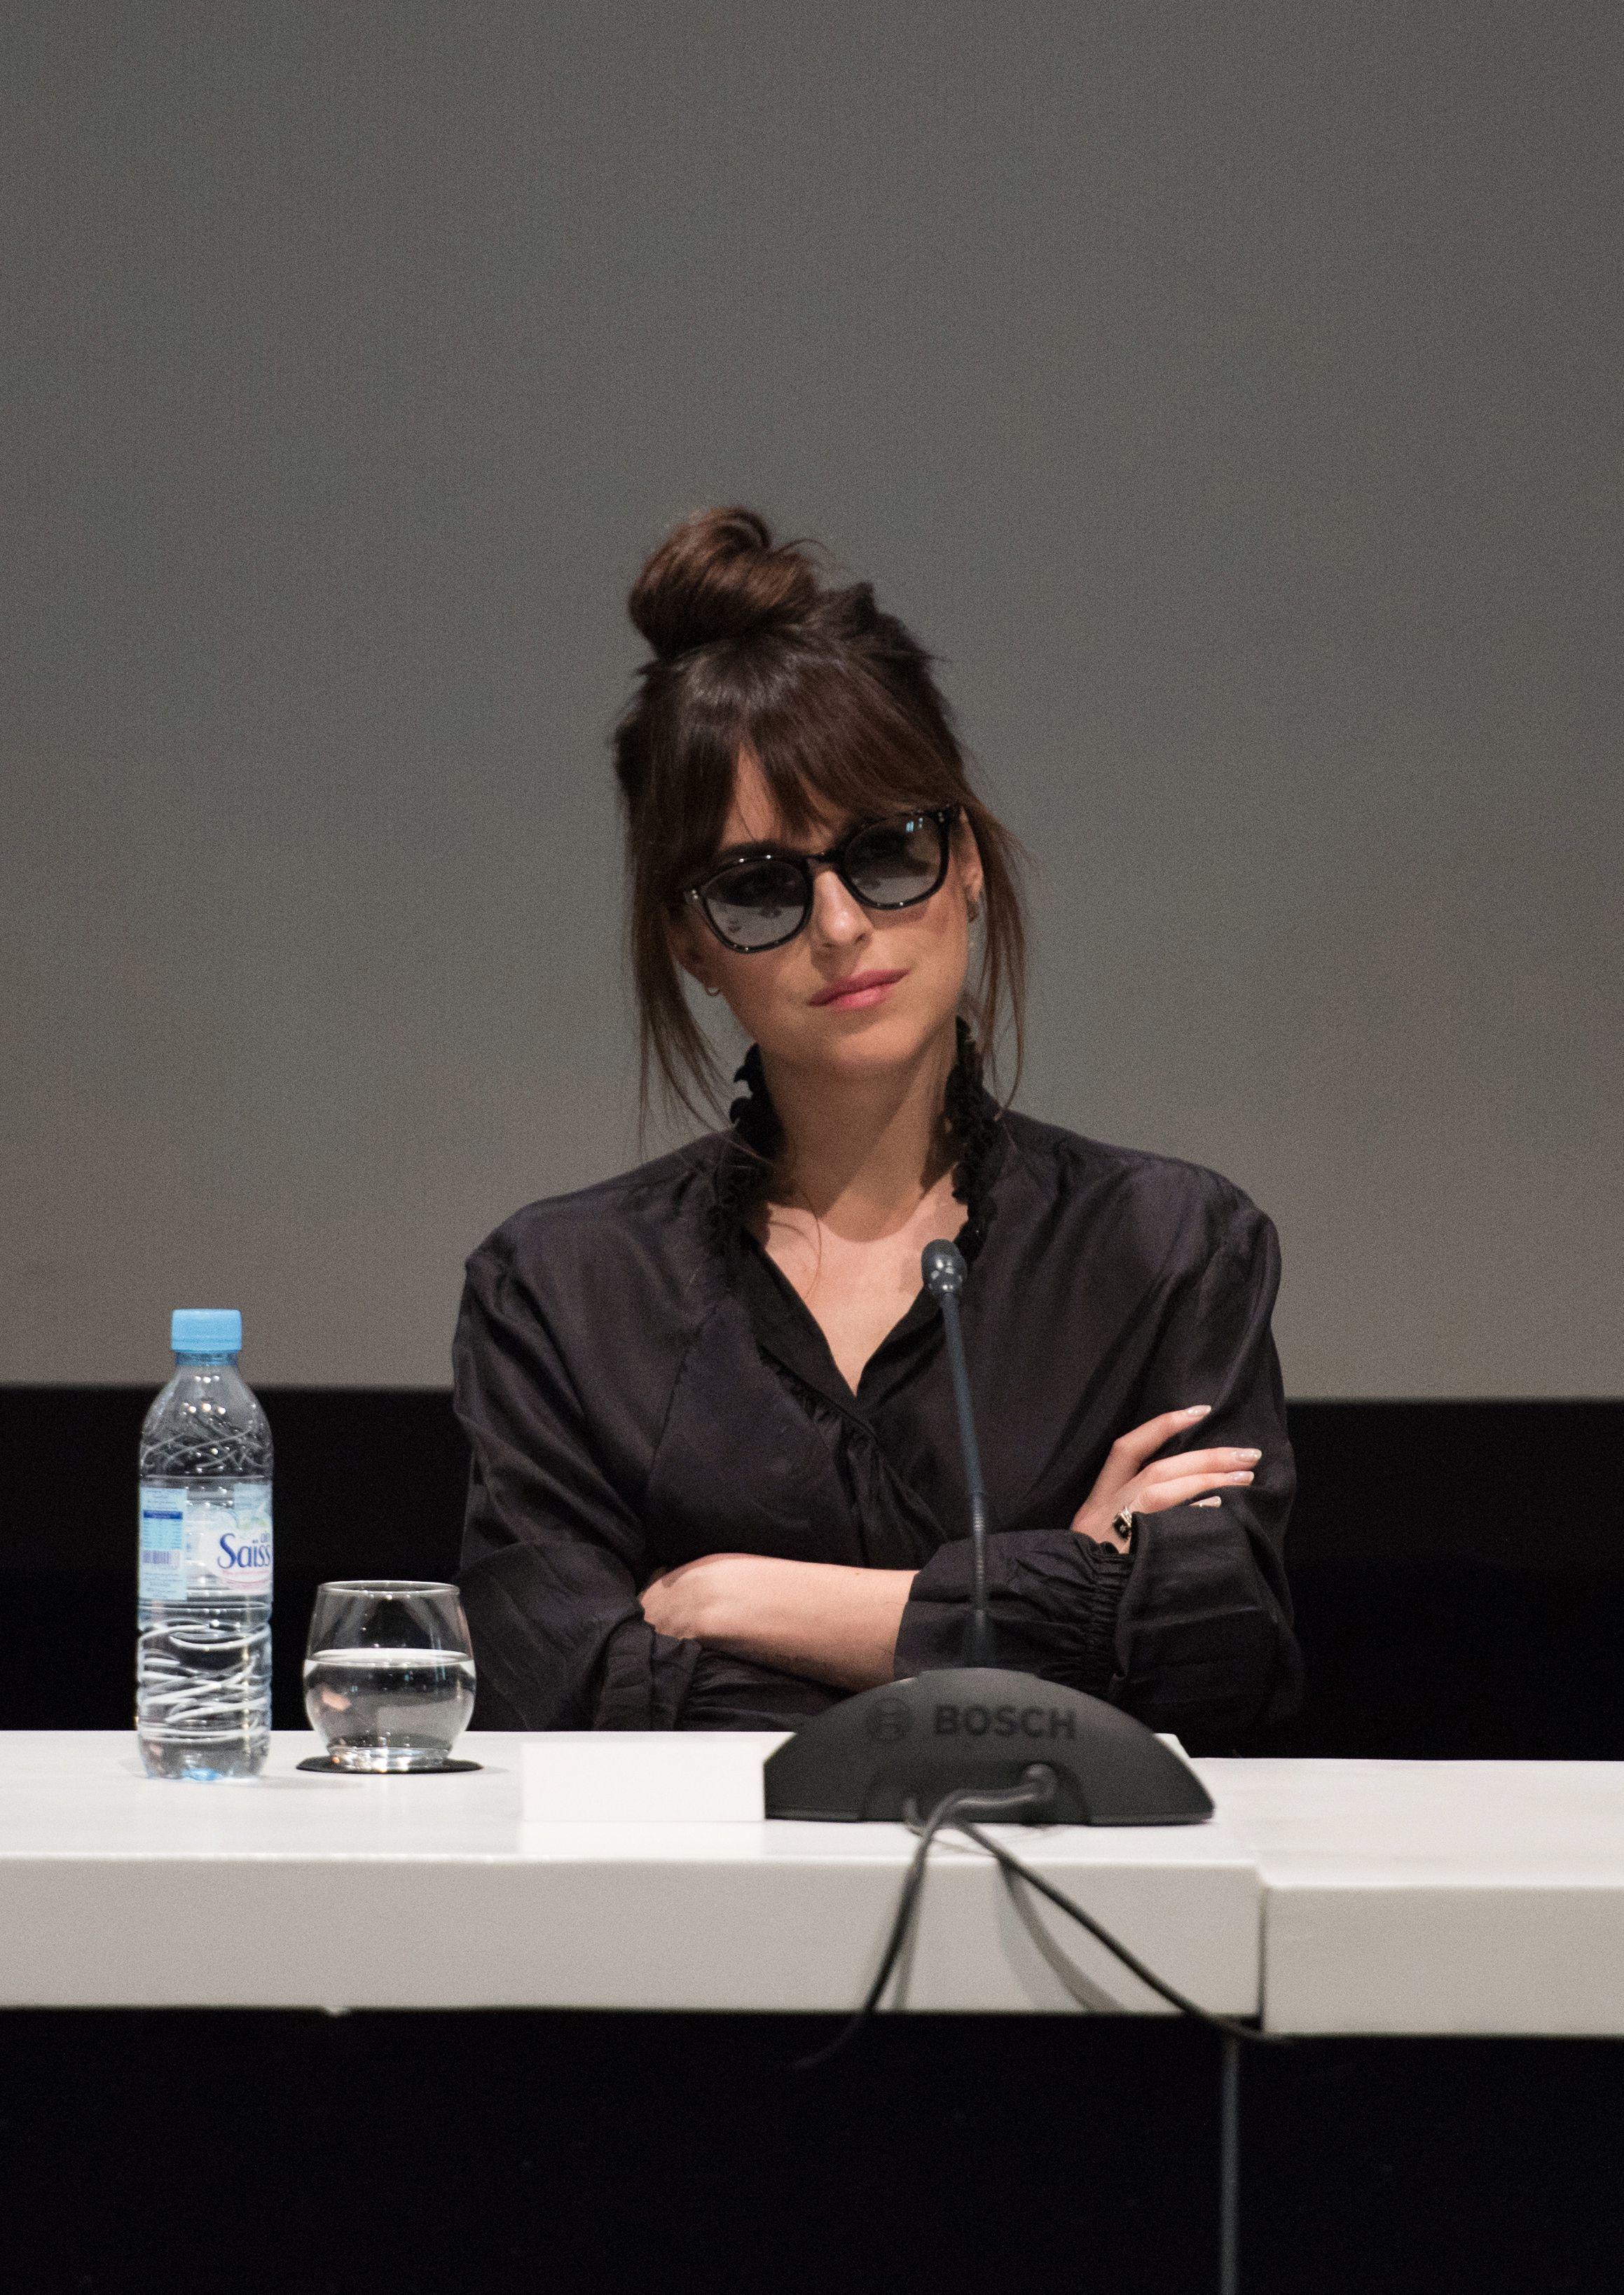 Dakota Johnson attends a press conference at the 17th annual Marrakech International Film Festival, in Marrakech, Morocco, on Dec. 1, 2018.